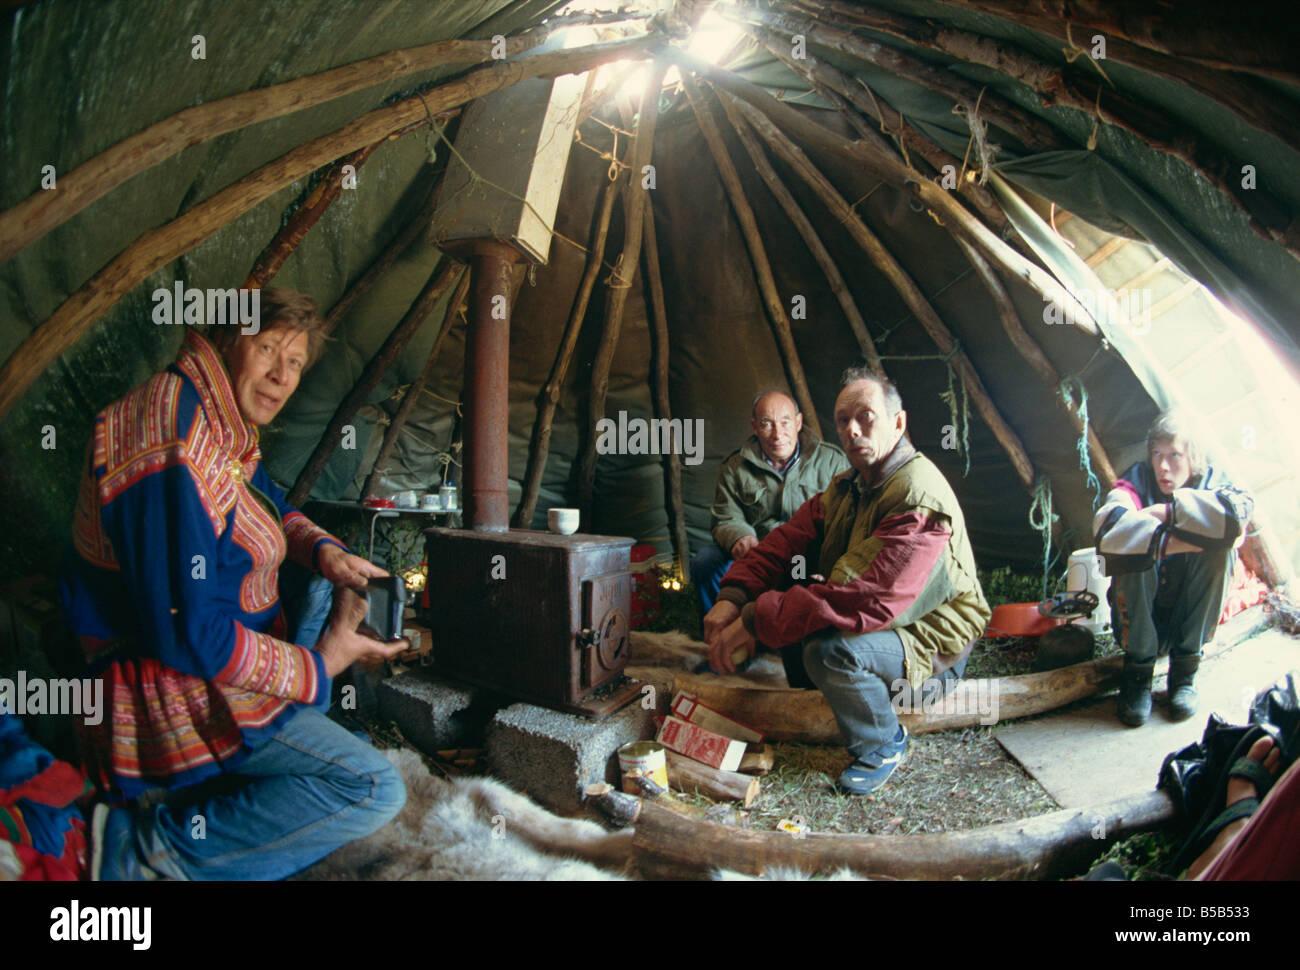 Sami man (Lapplander) inside laavo (tent), drinking moonshine, Finnmark, Norway, Scandinavia, Europe - Stock Image